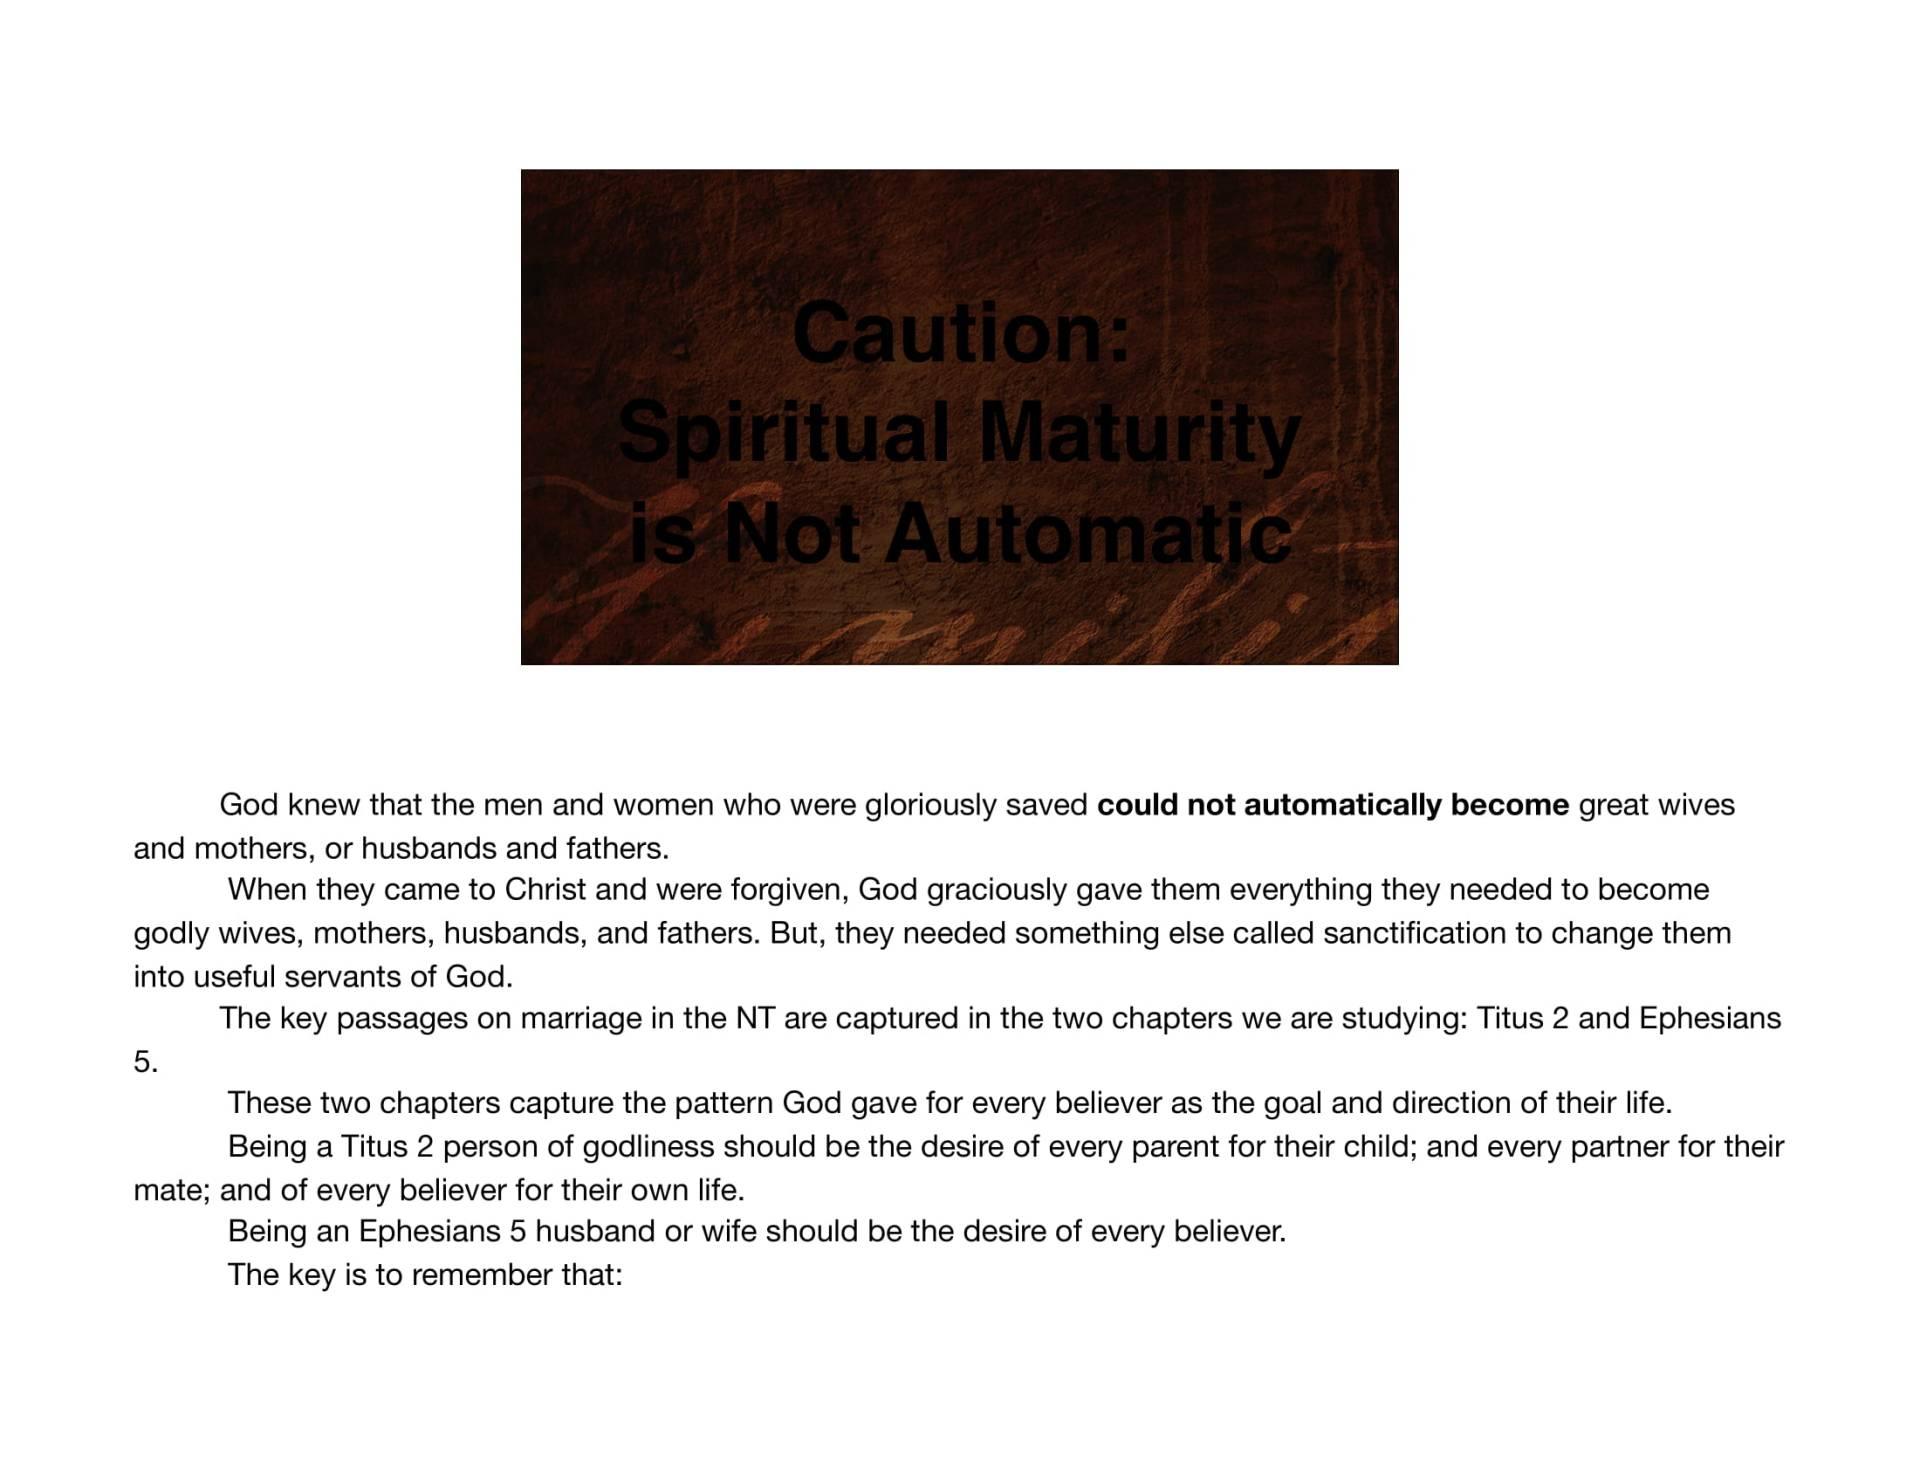 LGI-04 - Caution Men - Spiritual Maturity Is Not Automatic-09